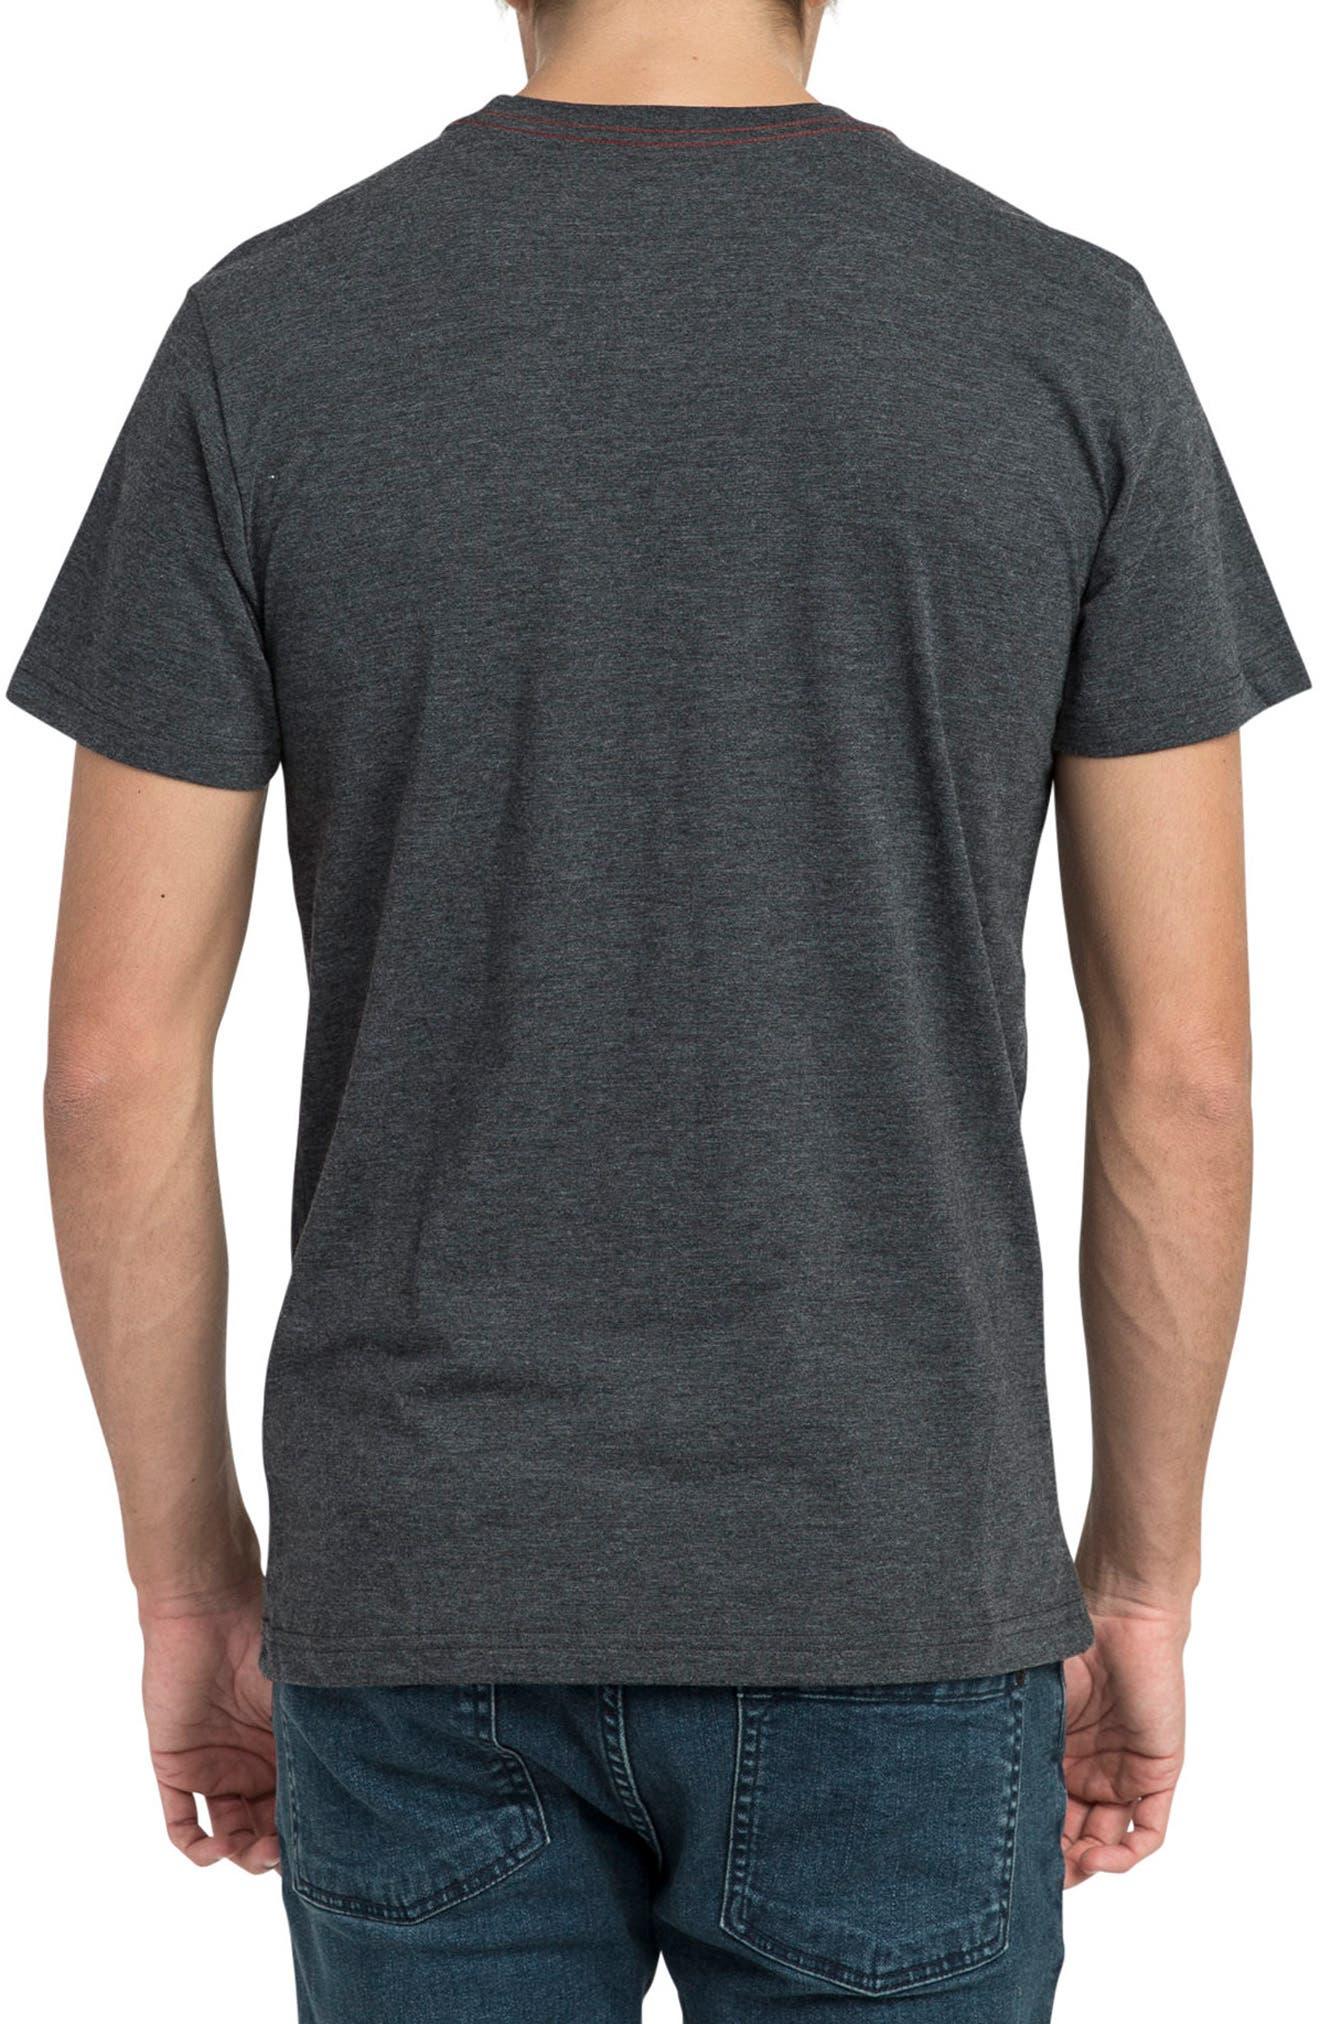 Dmote ANP T-Shirt,                             Alternate thumbnail 2, color,                             Black